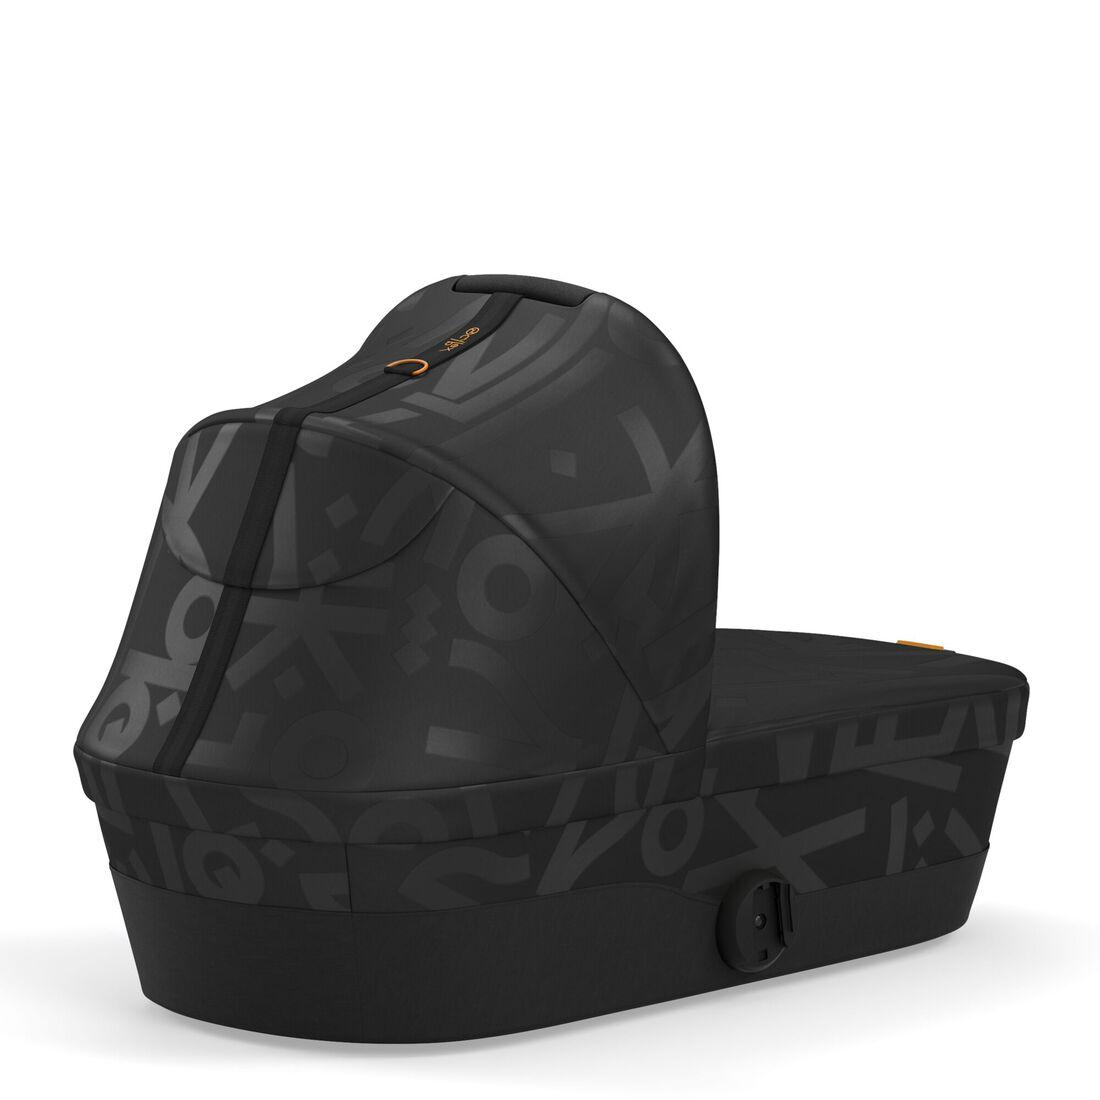 CYBEX Melio Cot - Real Black in Real Black large Bild 4